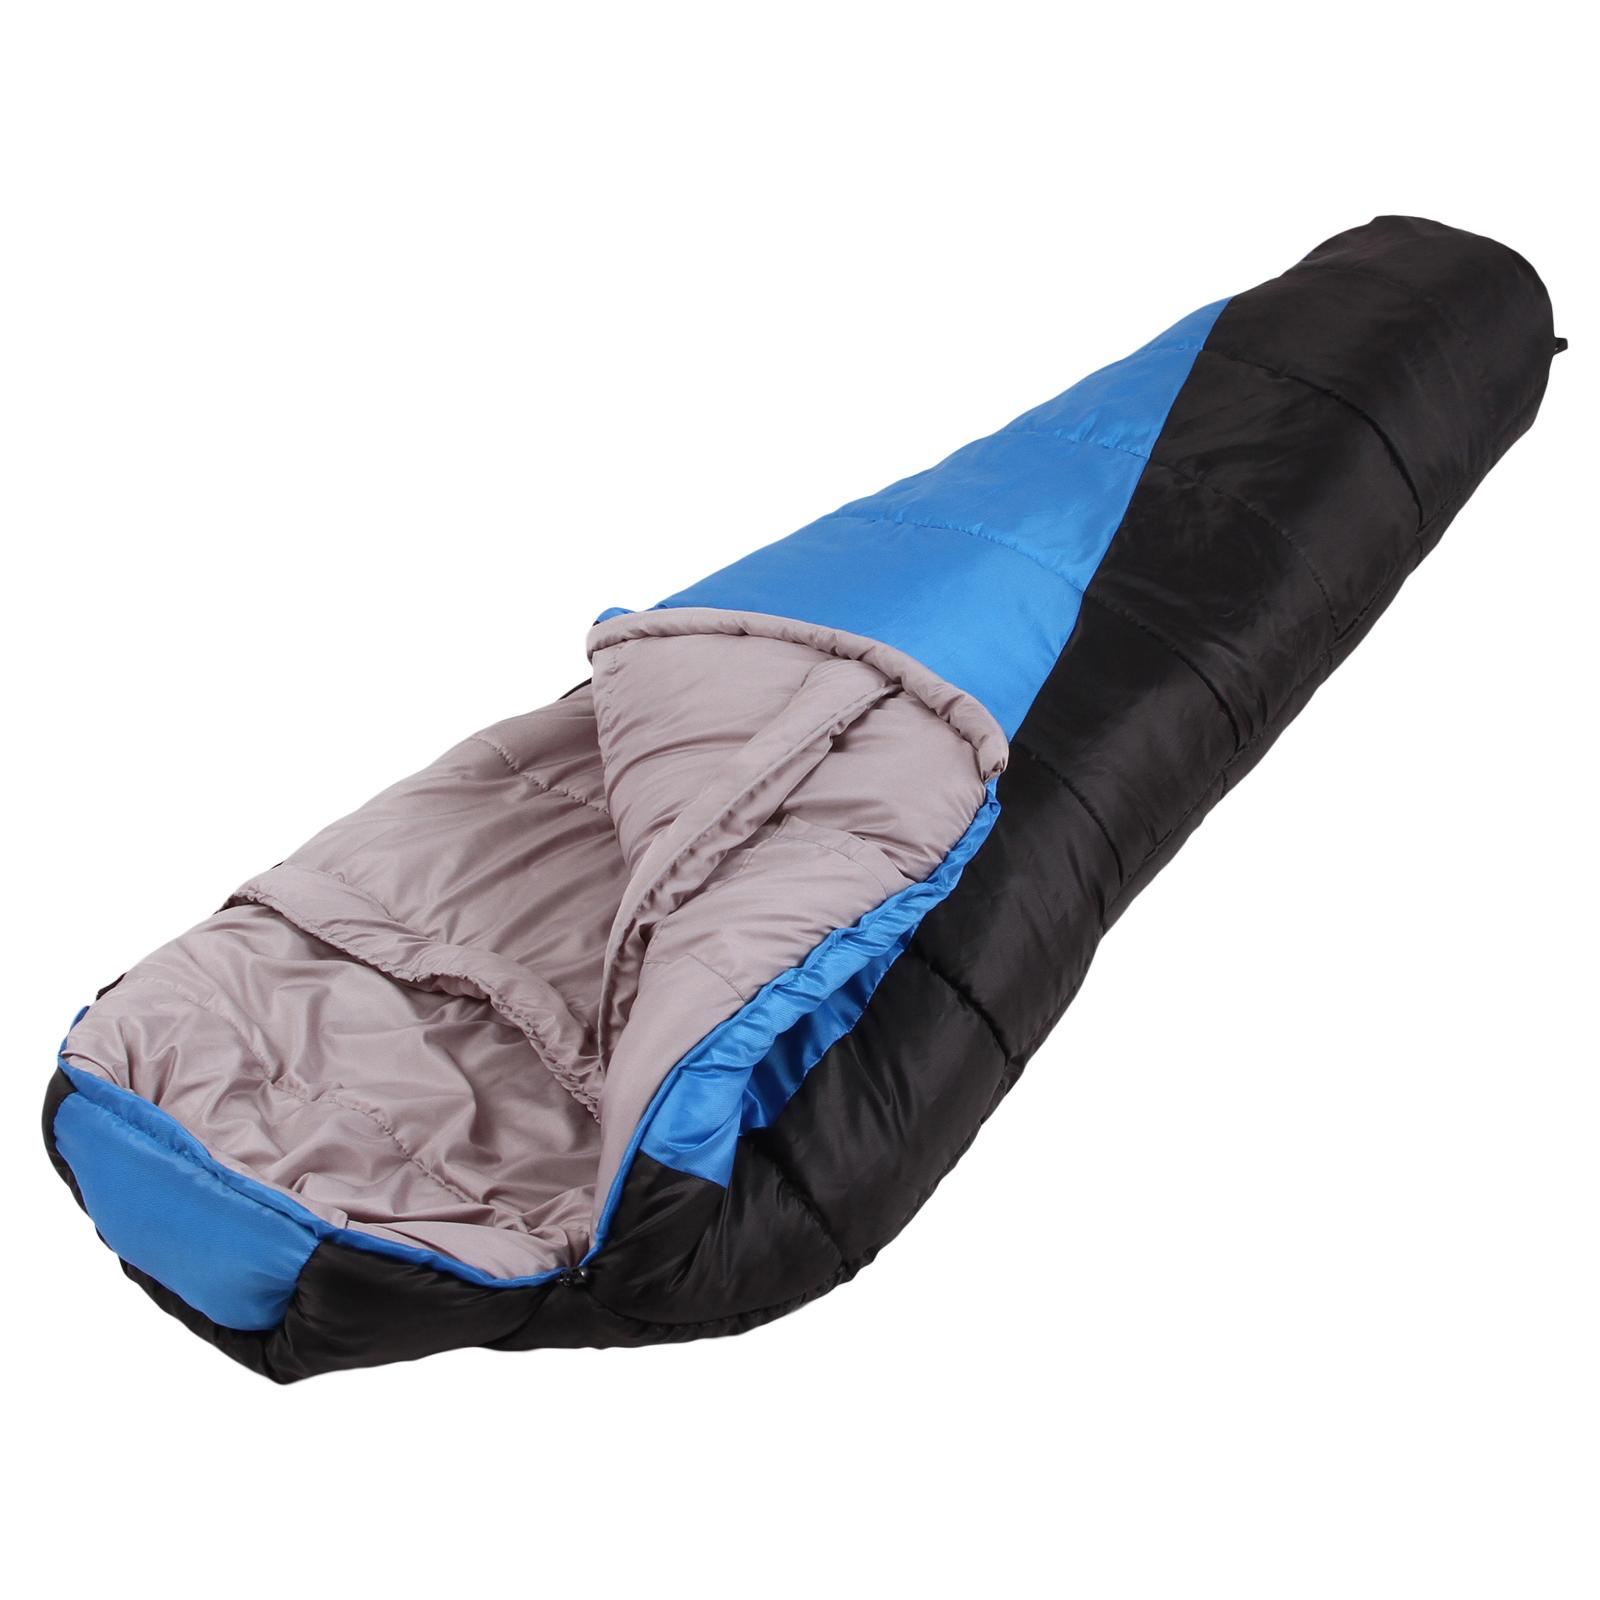 Azuma 7ft 3 Season Mummy Shape Sleeping Bag